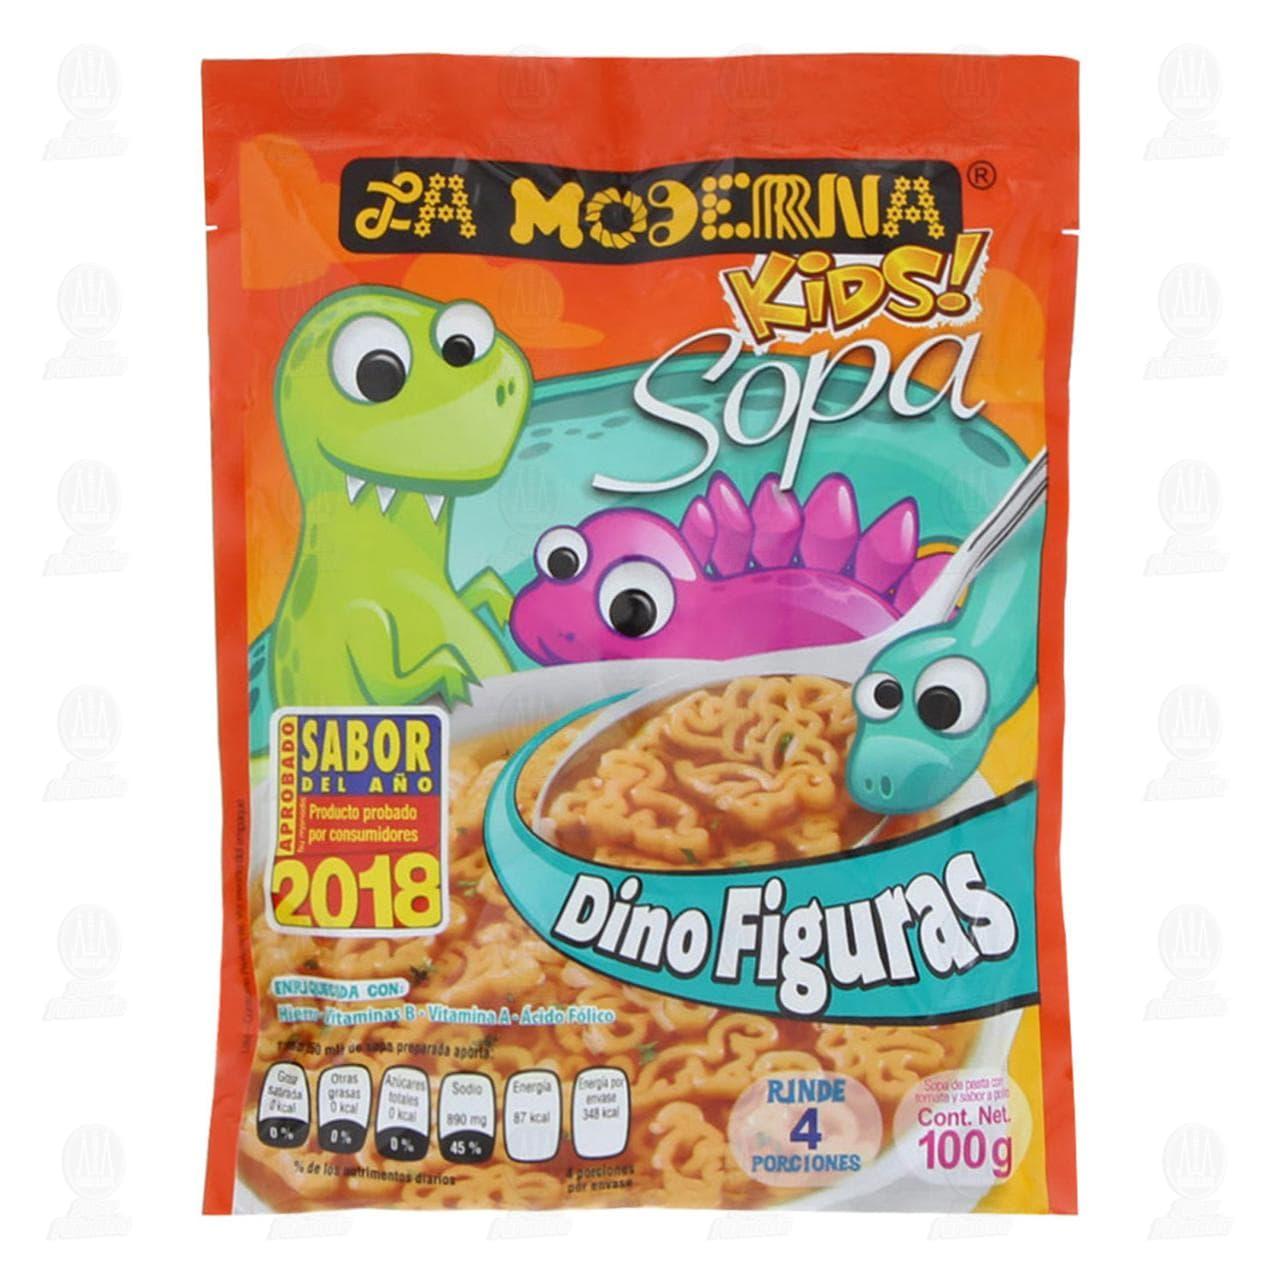 Sopa La Moderna Kids Dinofiguras, 100 gr.